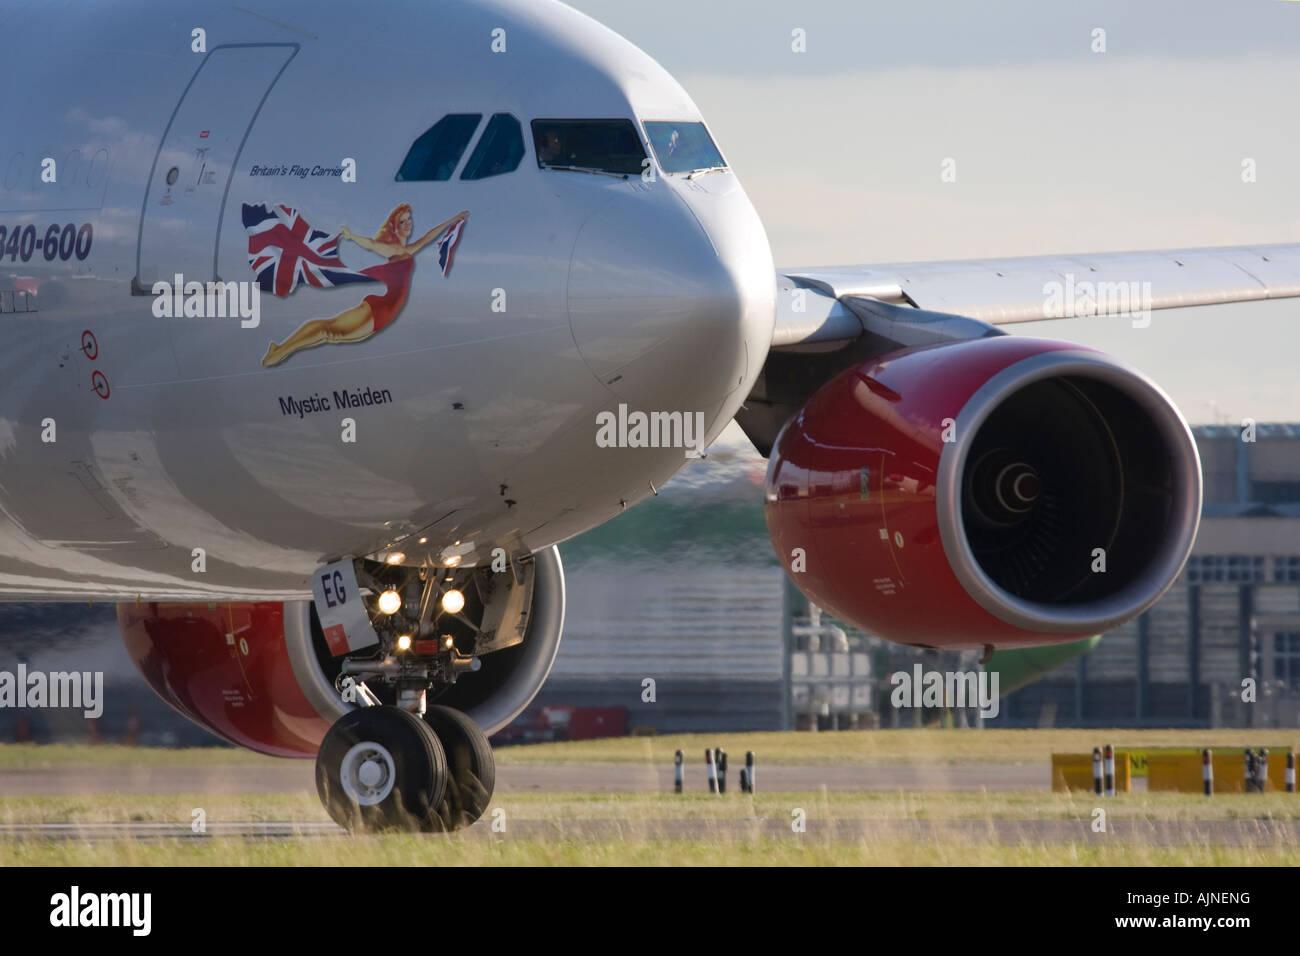 Virgin Atlantic Airways Airbus A340-642 taxiing for departure at London Heathrow Airport, UK - Stock Image